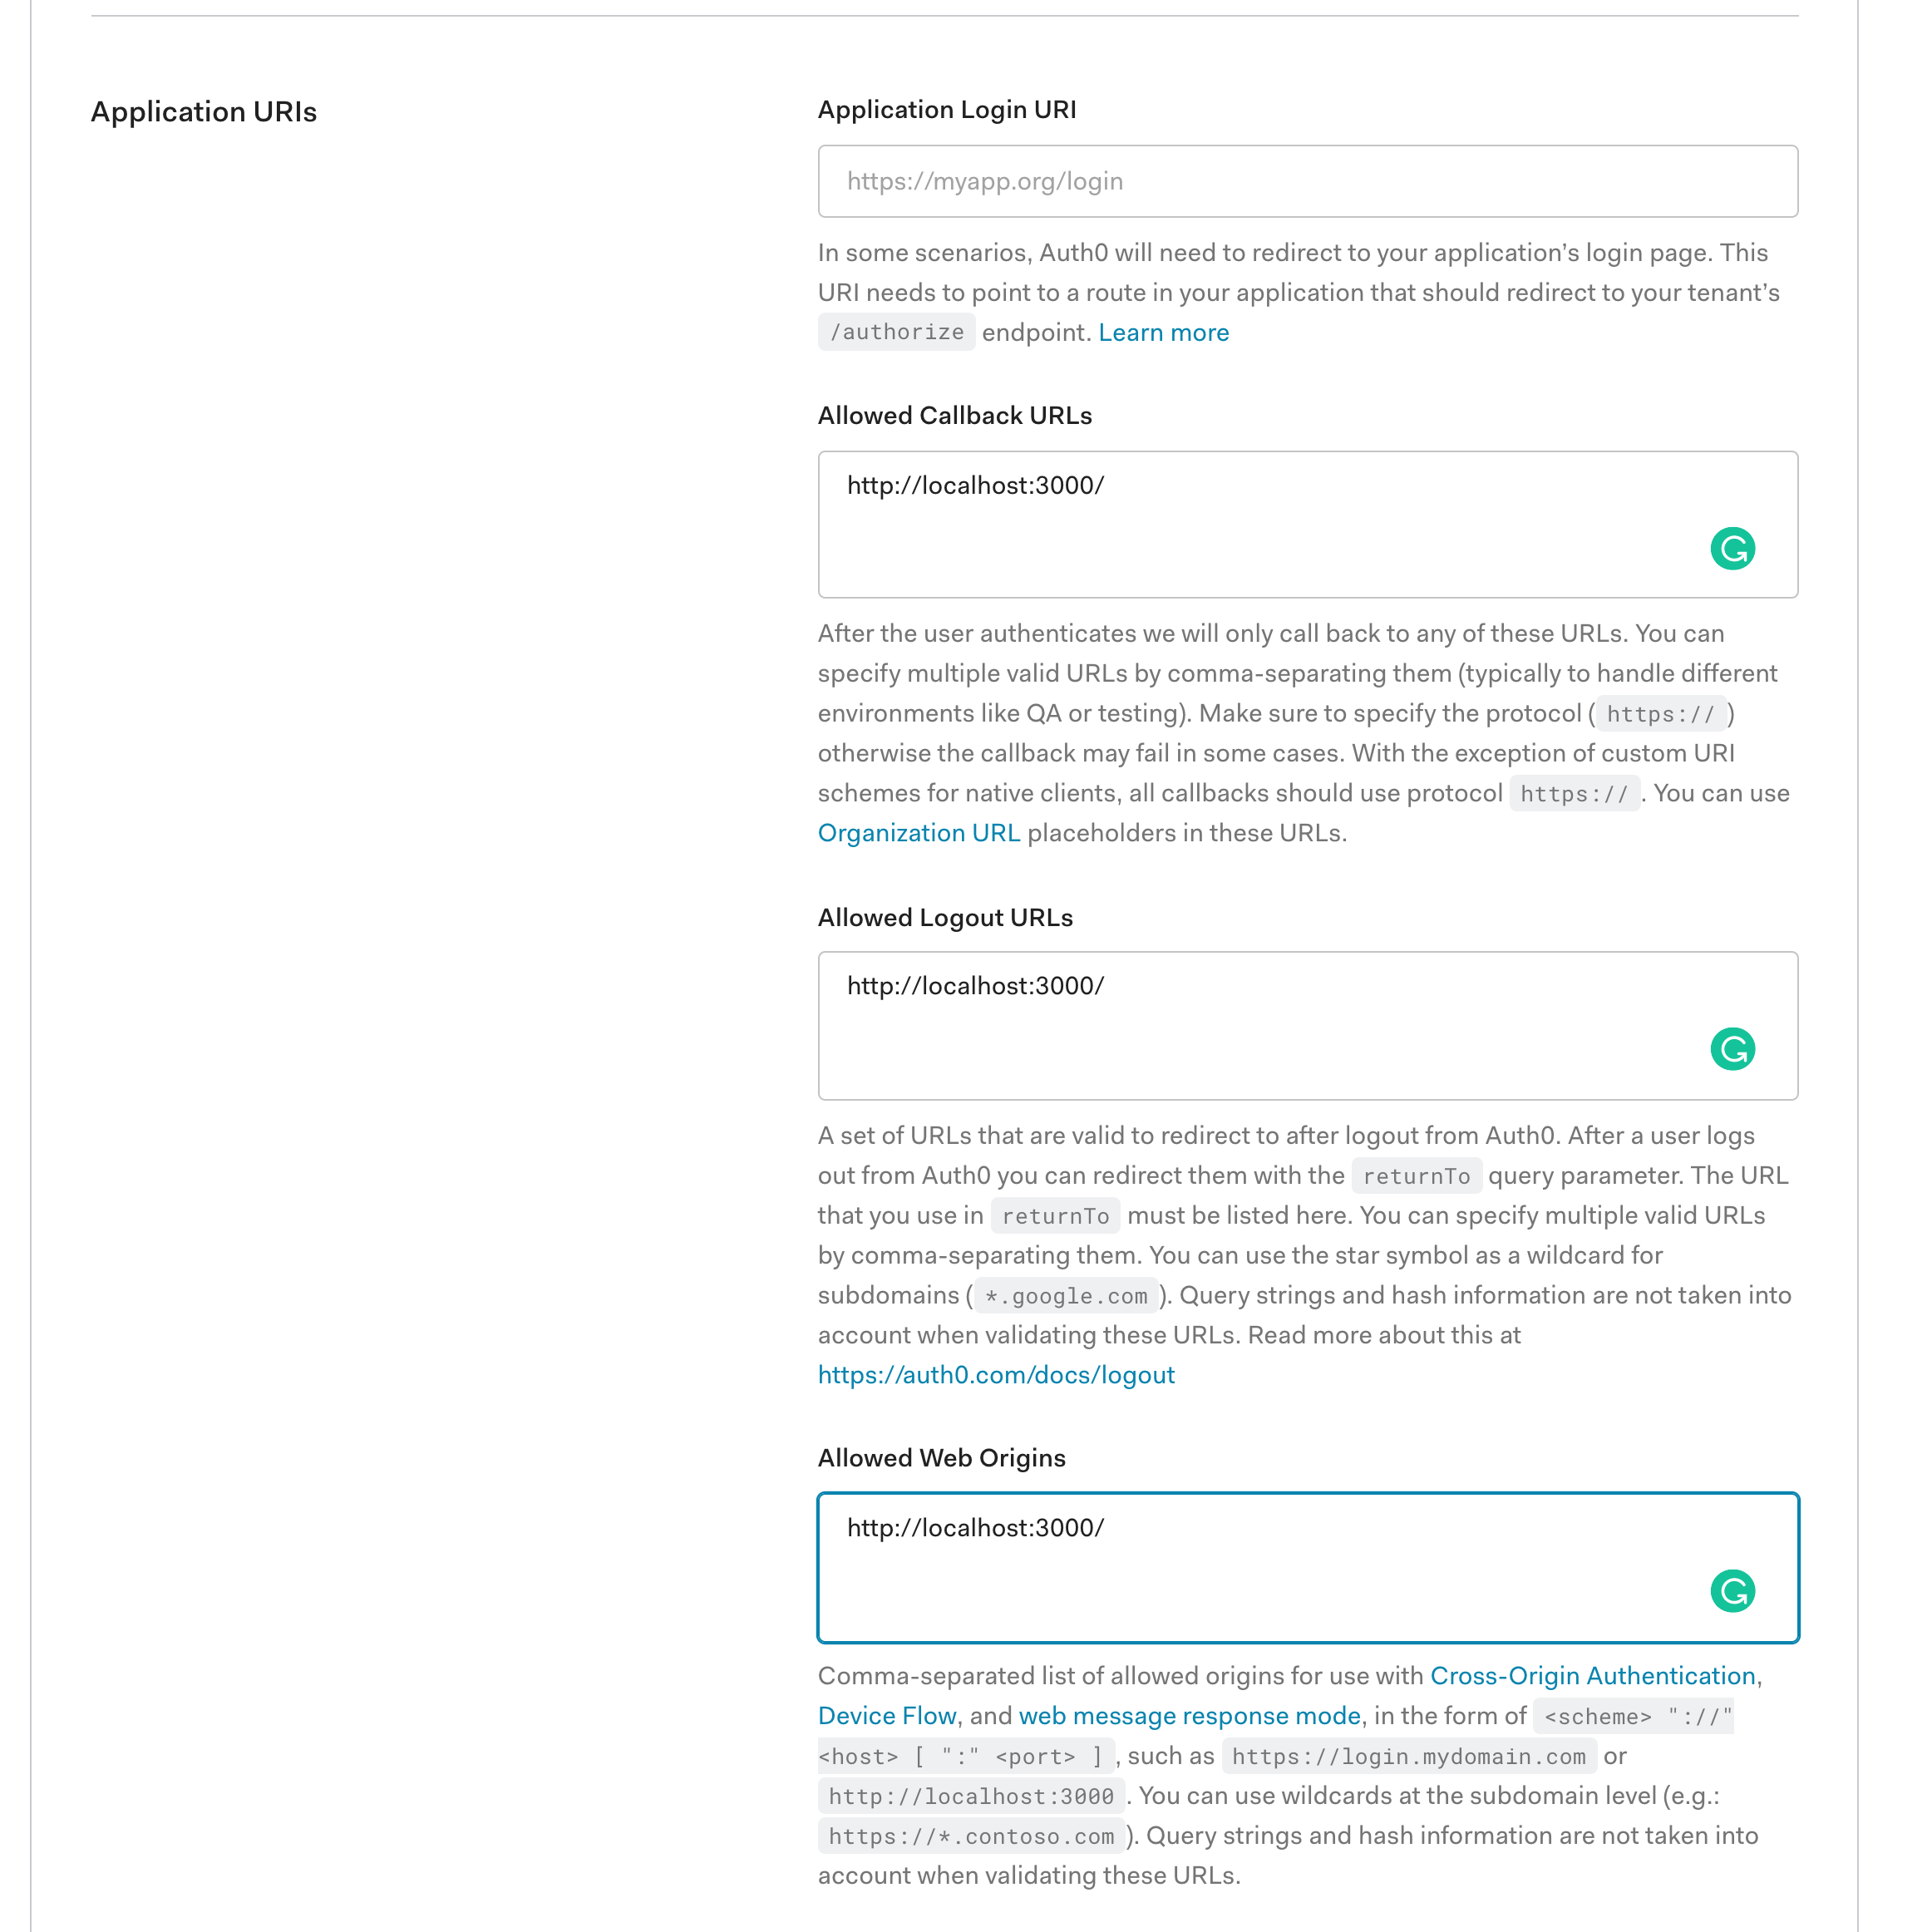 Screenshot of Auth0 magic mirror application